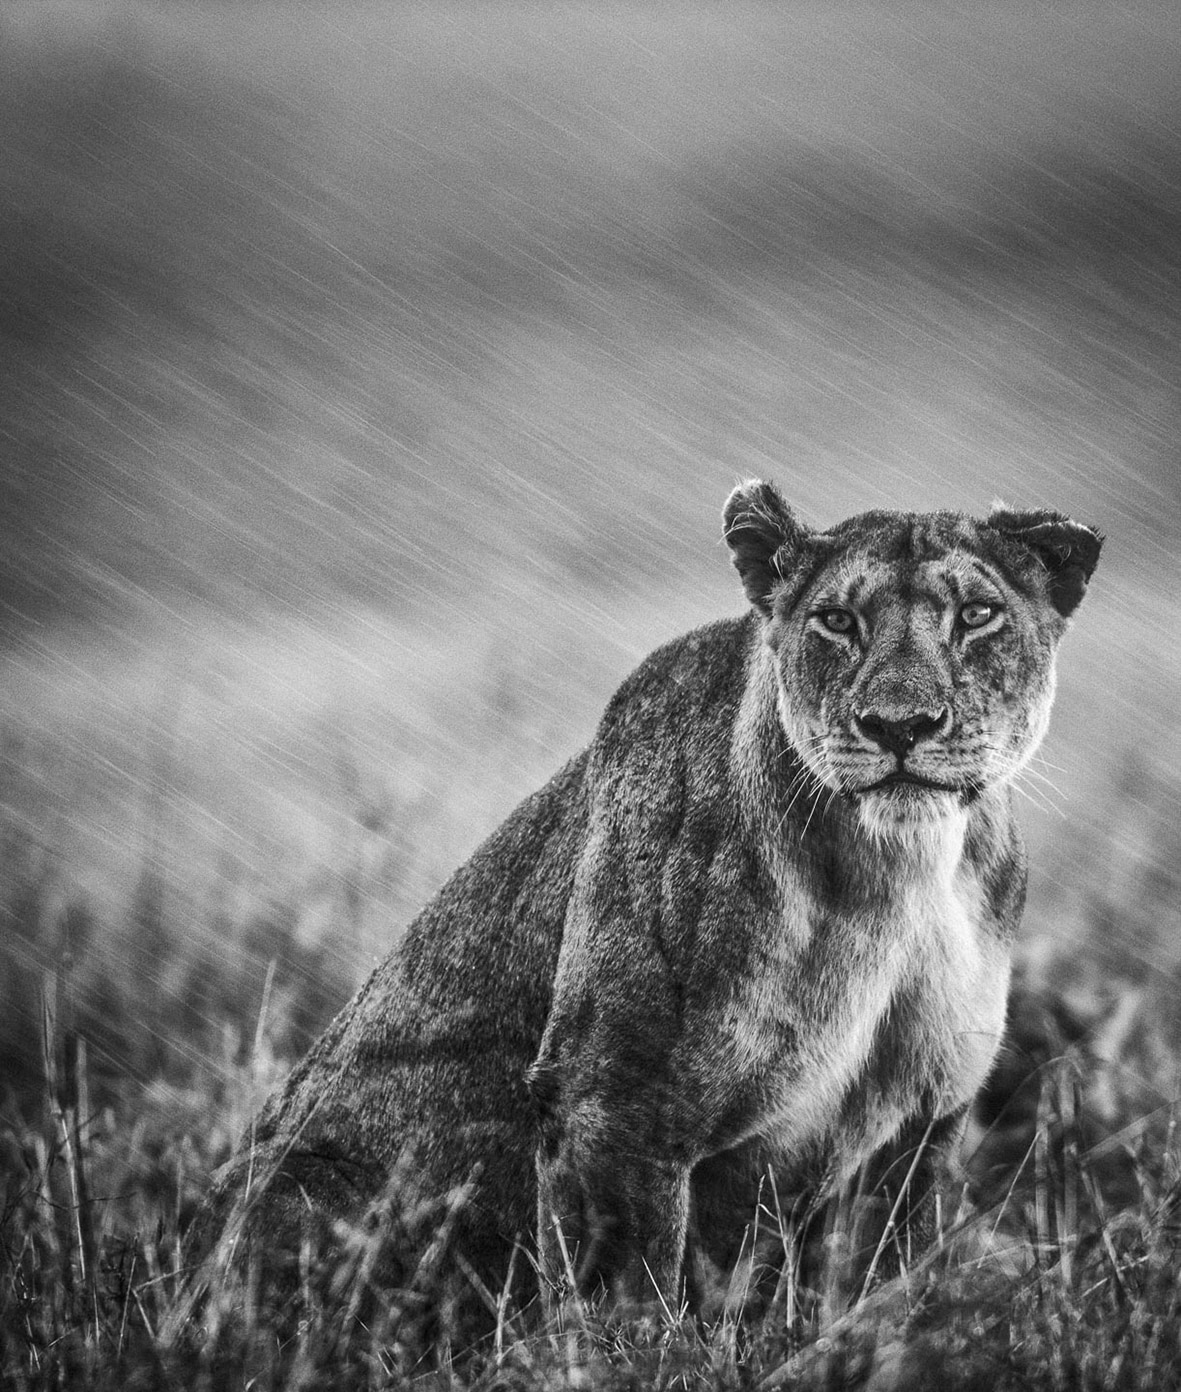 WILDLIFE. Portrait of lioness in heavy rain, 2012. Credit Federico Veronesi.